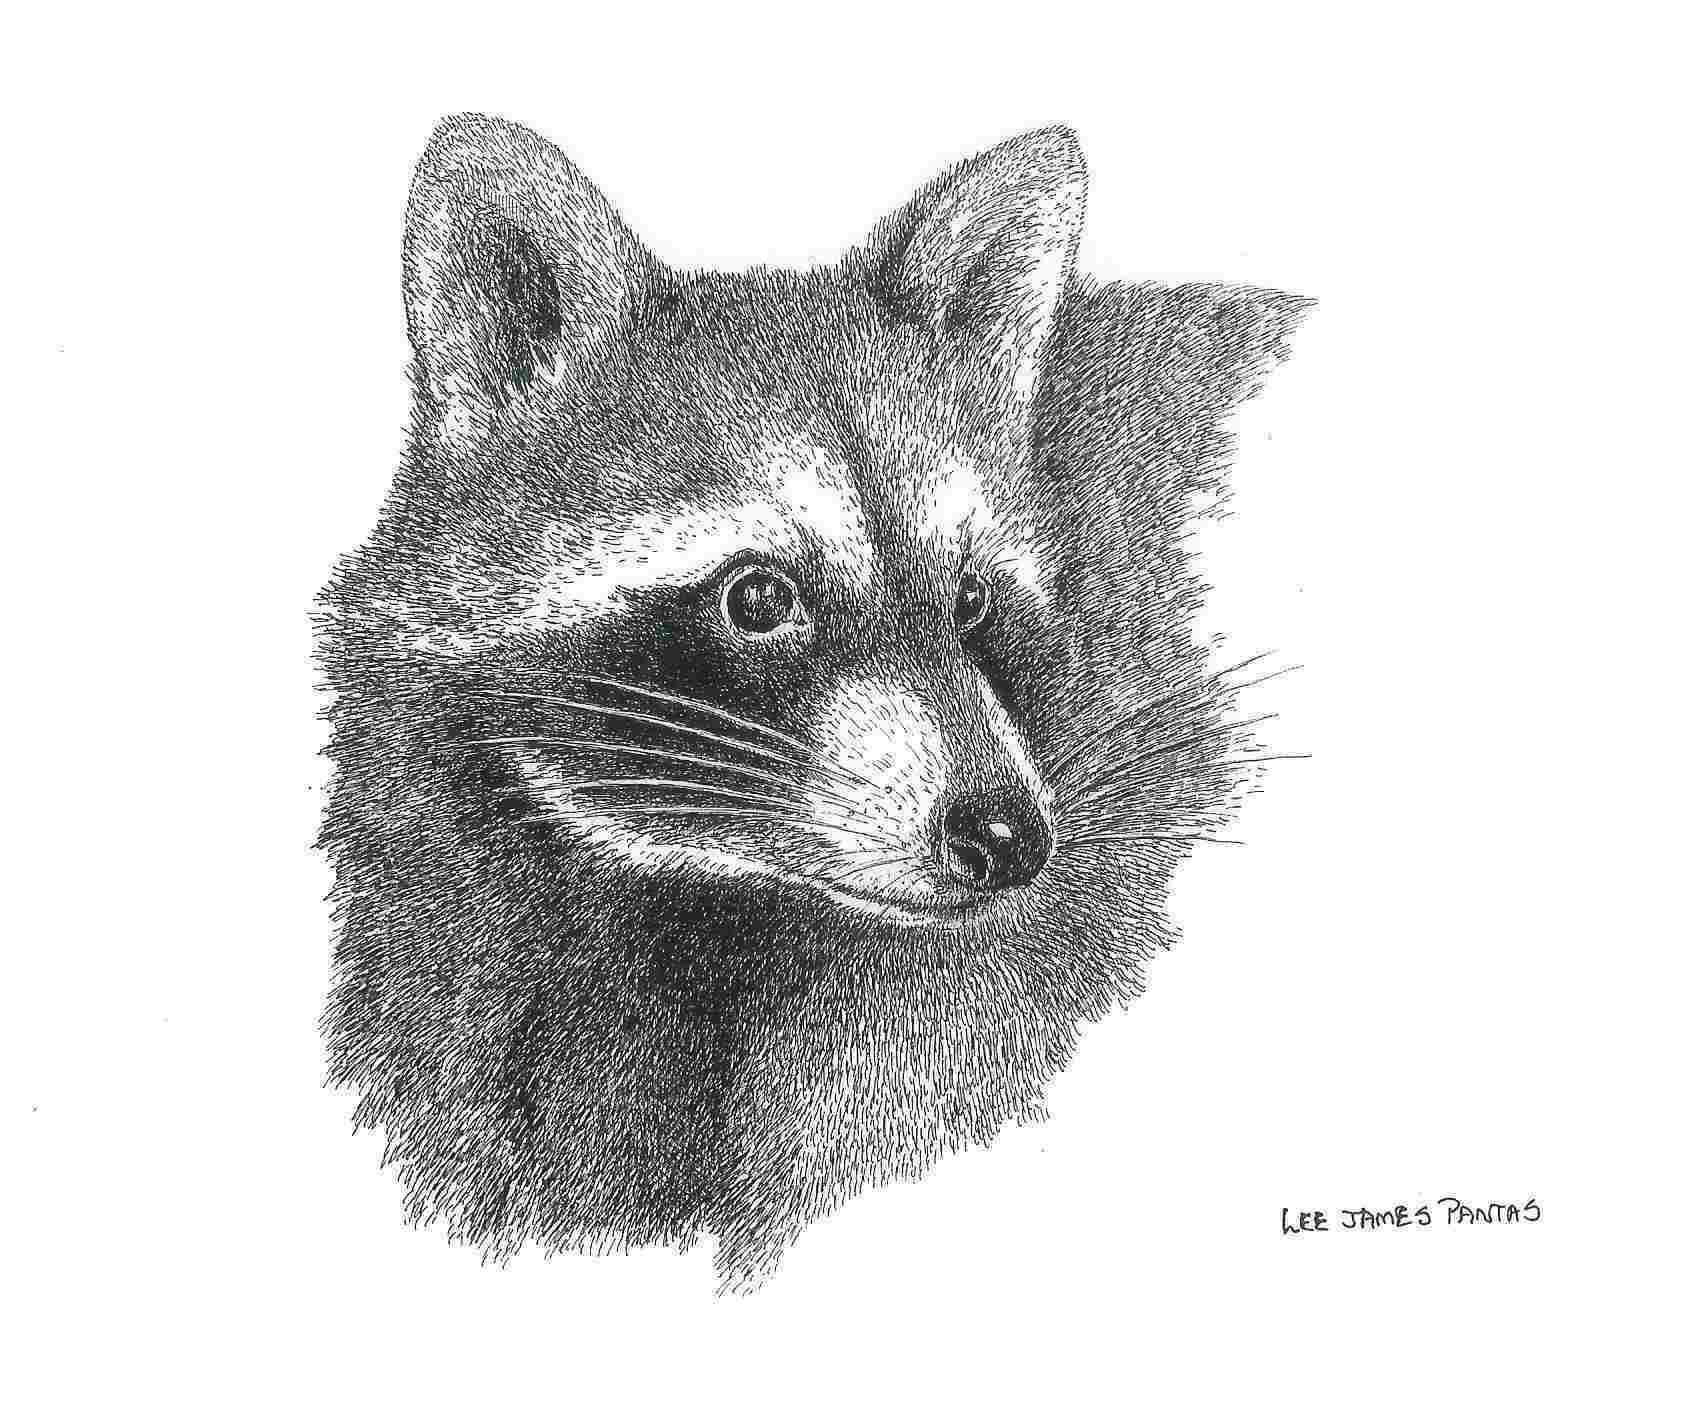 Drawn raccoon pen and ink Raccoon animals